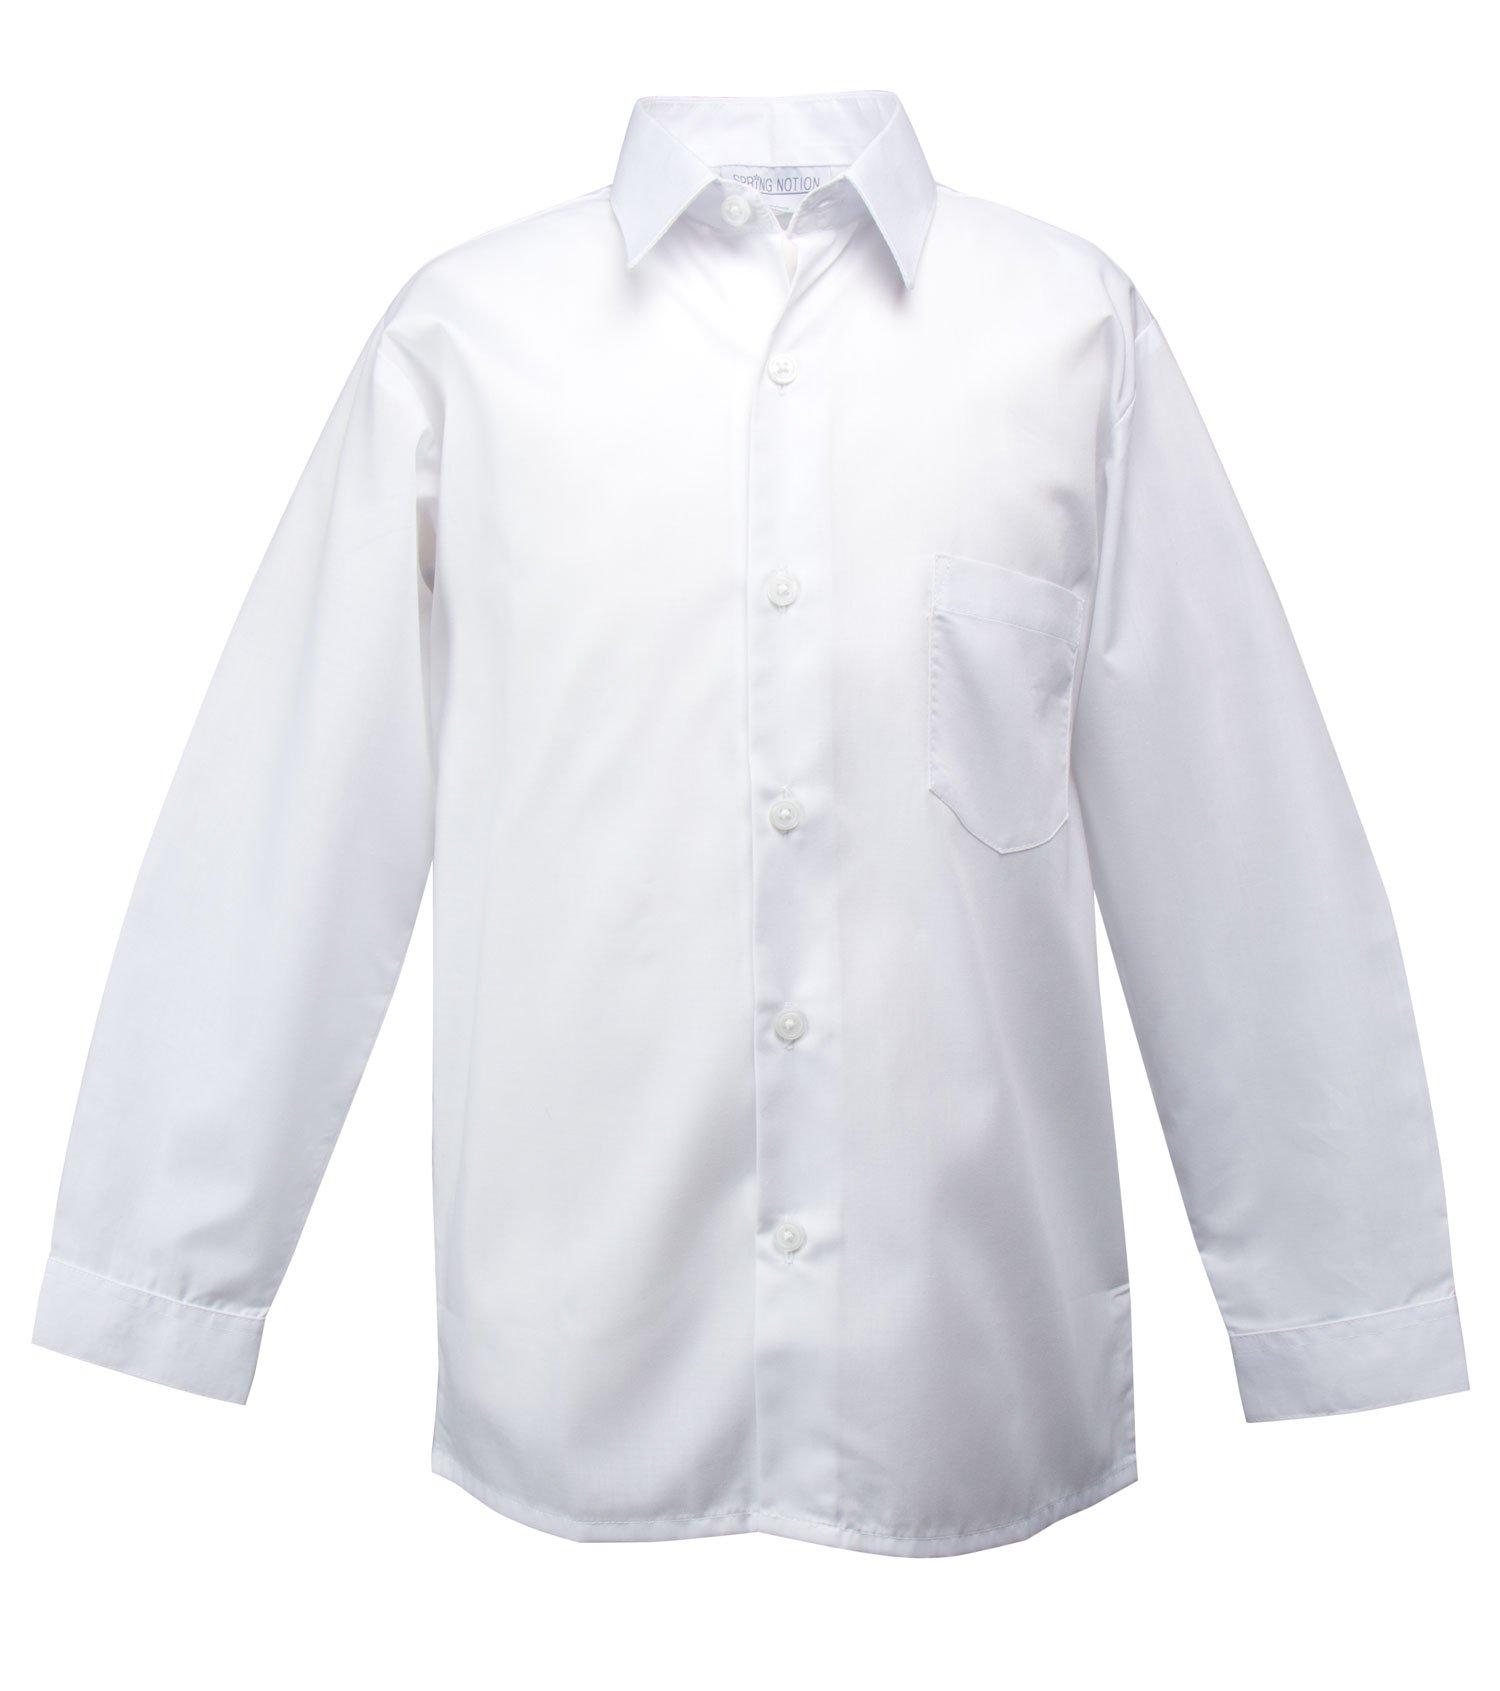 Spring Notion Big Boys' Long Sleeve Dress Shirt 3T White